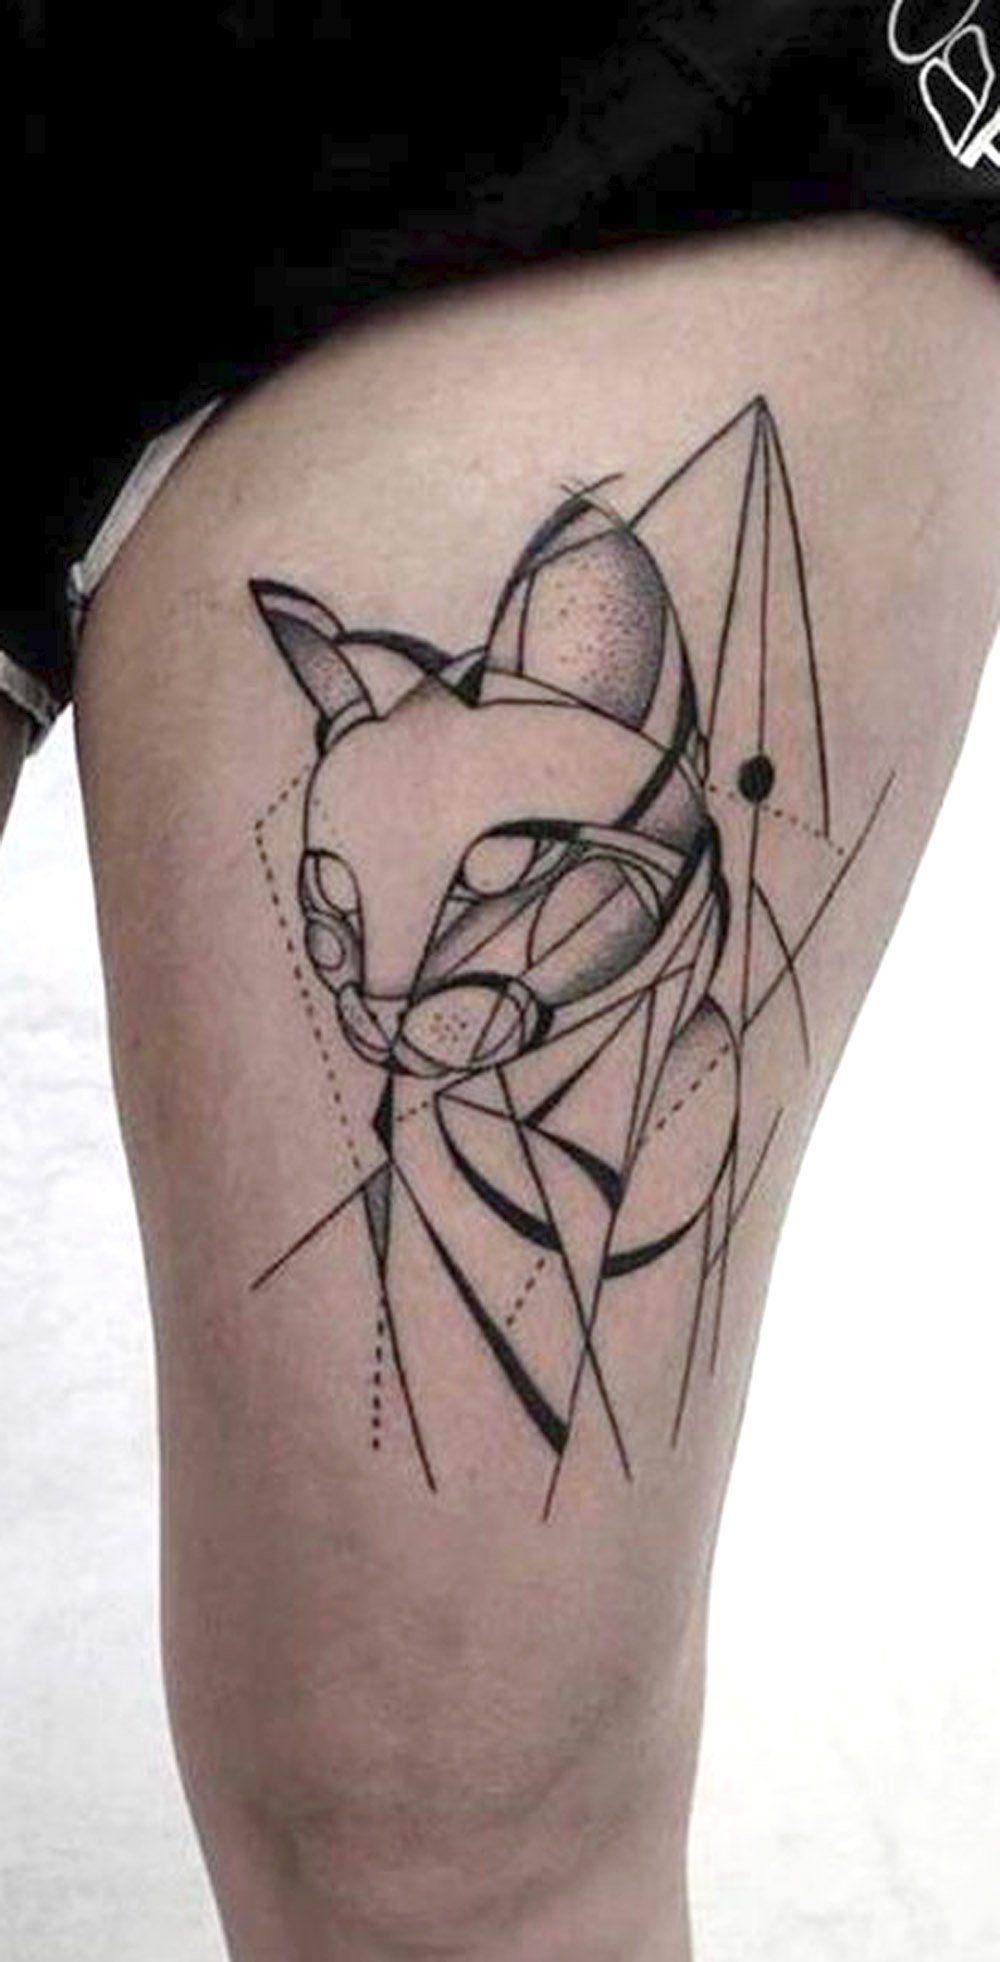 fb3f38c2fd858 Cool Badass Geometric Cat Thigh Tattoo Ideas for Women - geometrische Katze  Oberschenkel Tattoo Ideen für Frauen - www.MyBodiArt.com